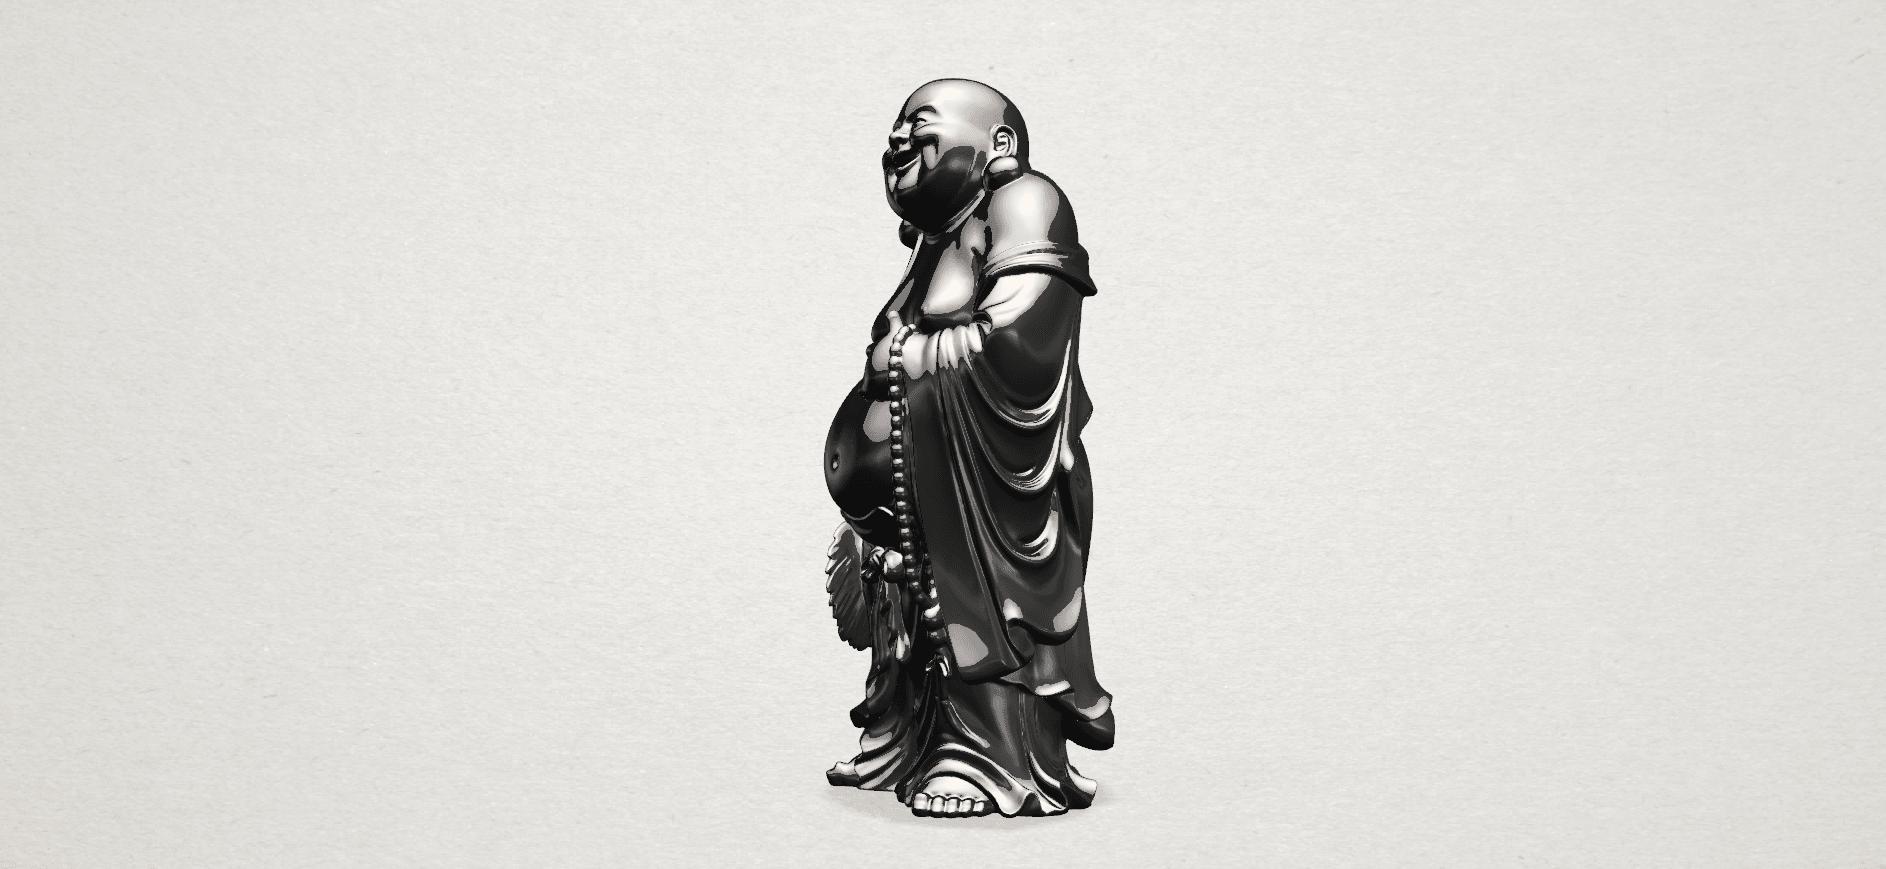 TDA0070 Metteyya Buddha 01 - 88mm - B02.png Download free STL file Metteyya Buddha 01 • 3D print object, GeorgesNikkei